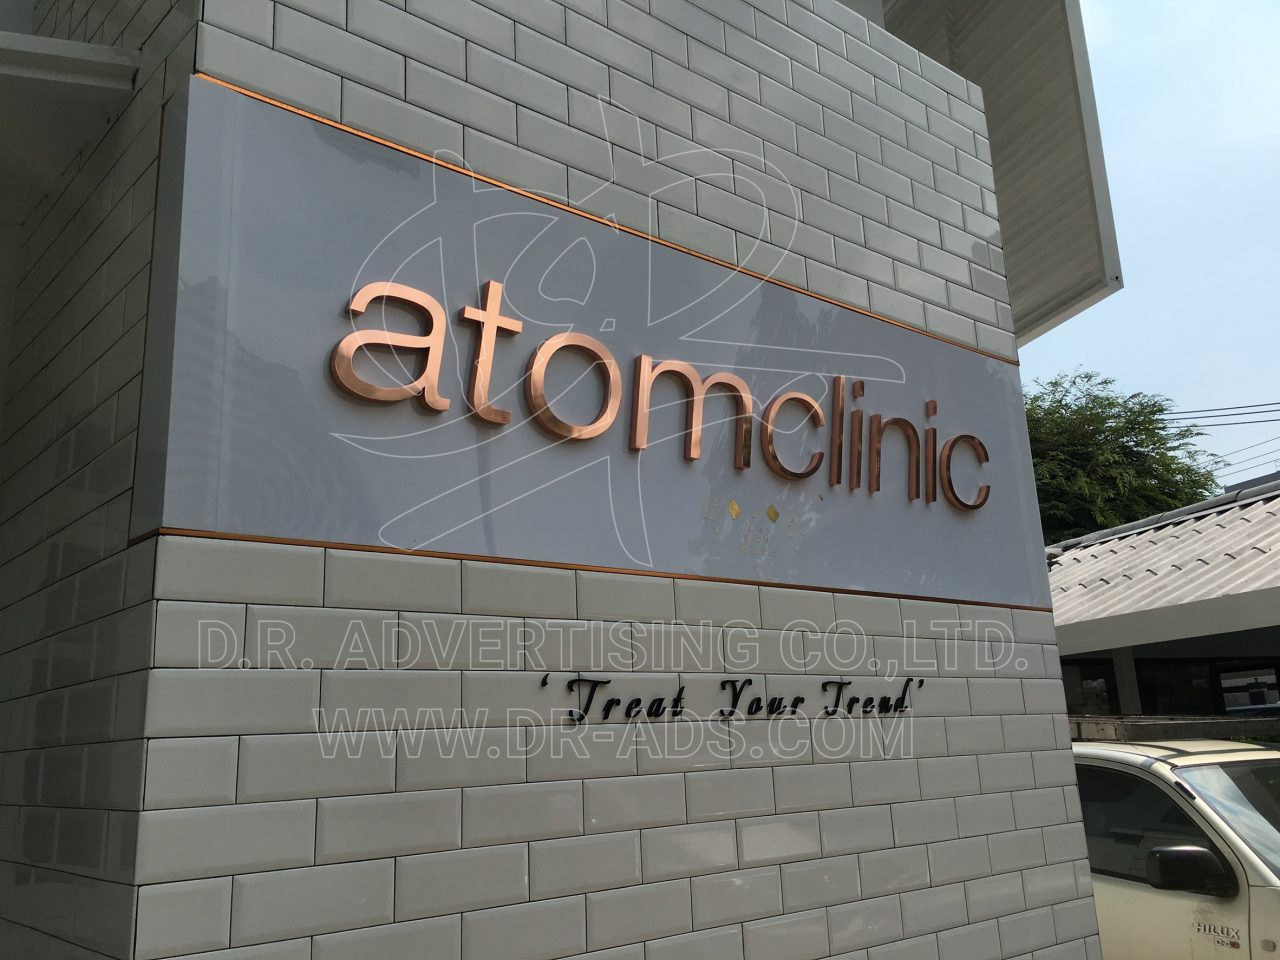 Atomclinic ป้ายโลโก้บริษัท หน้าบริษัท